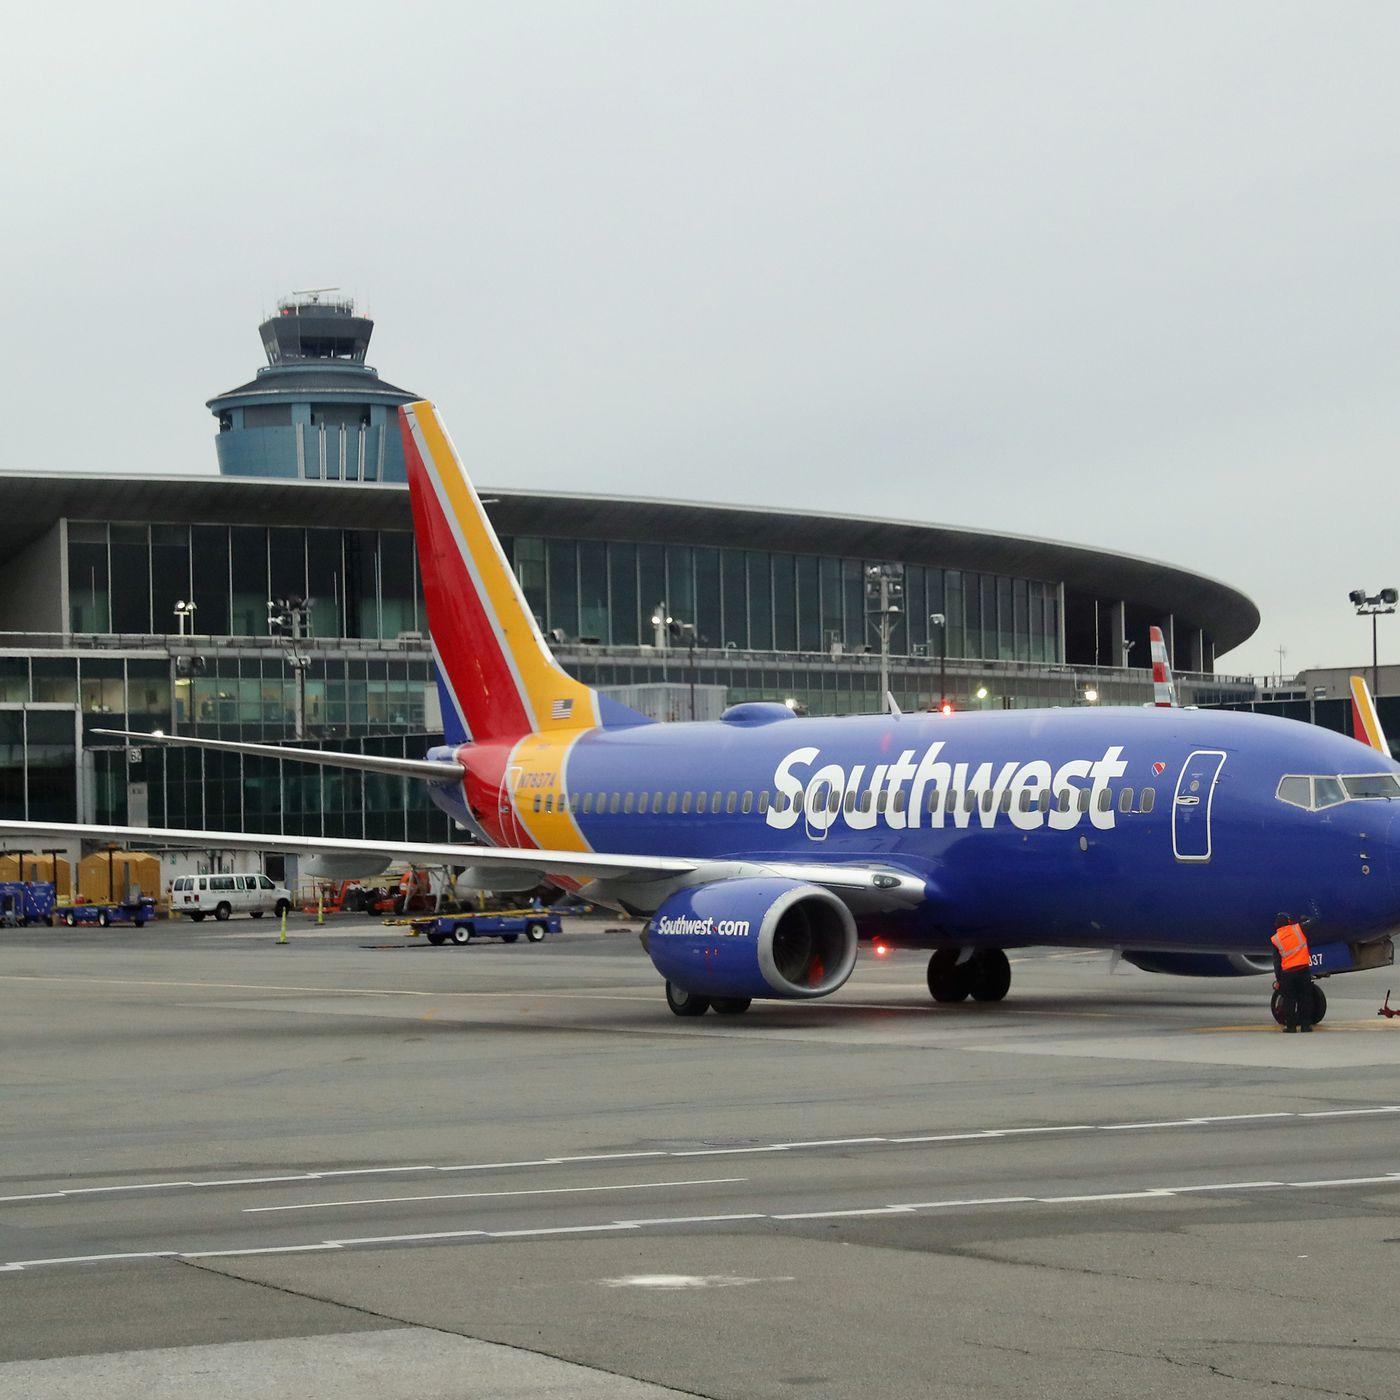 Flight delays into LaGuardia Airport amid staff shortages - Curbed NY